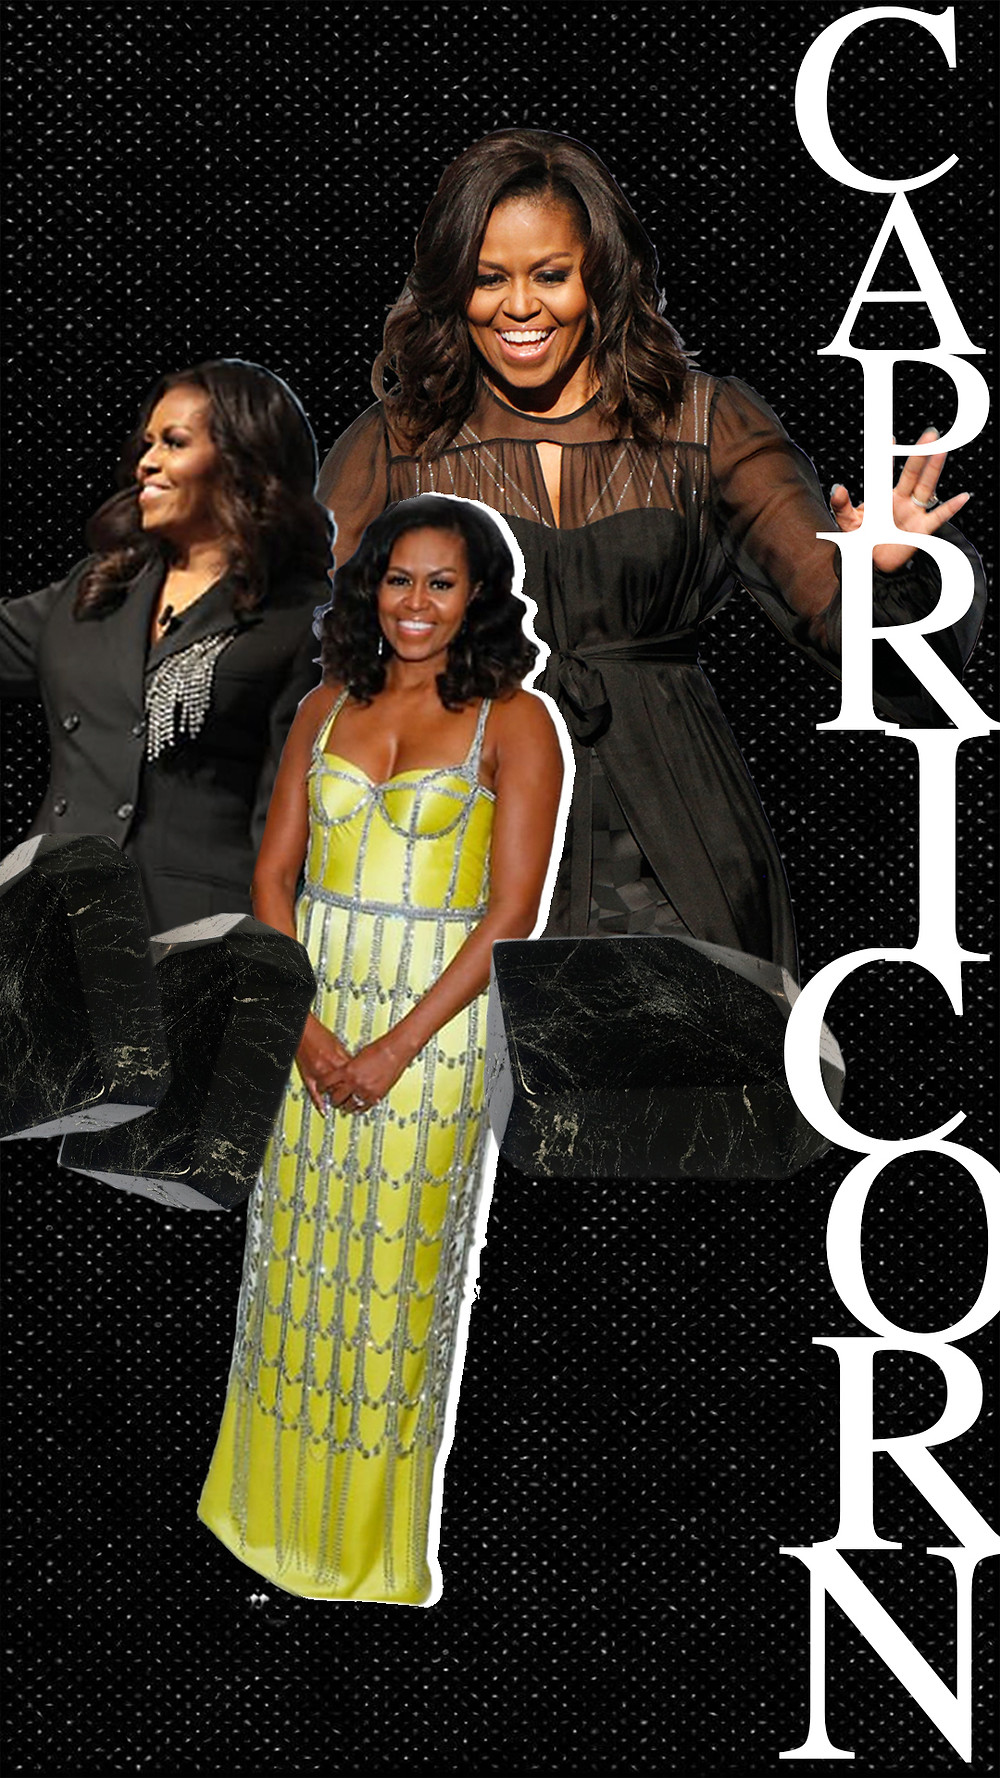 Michelle Obama, images via Angela Peterson/Milwa, @michelleobama